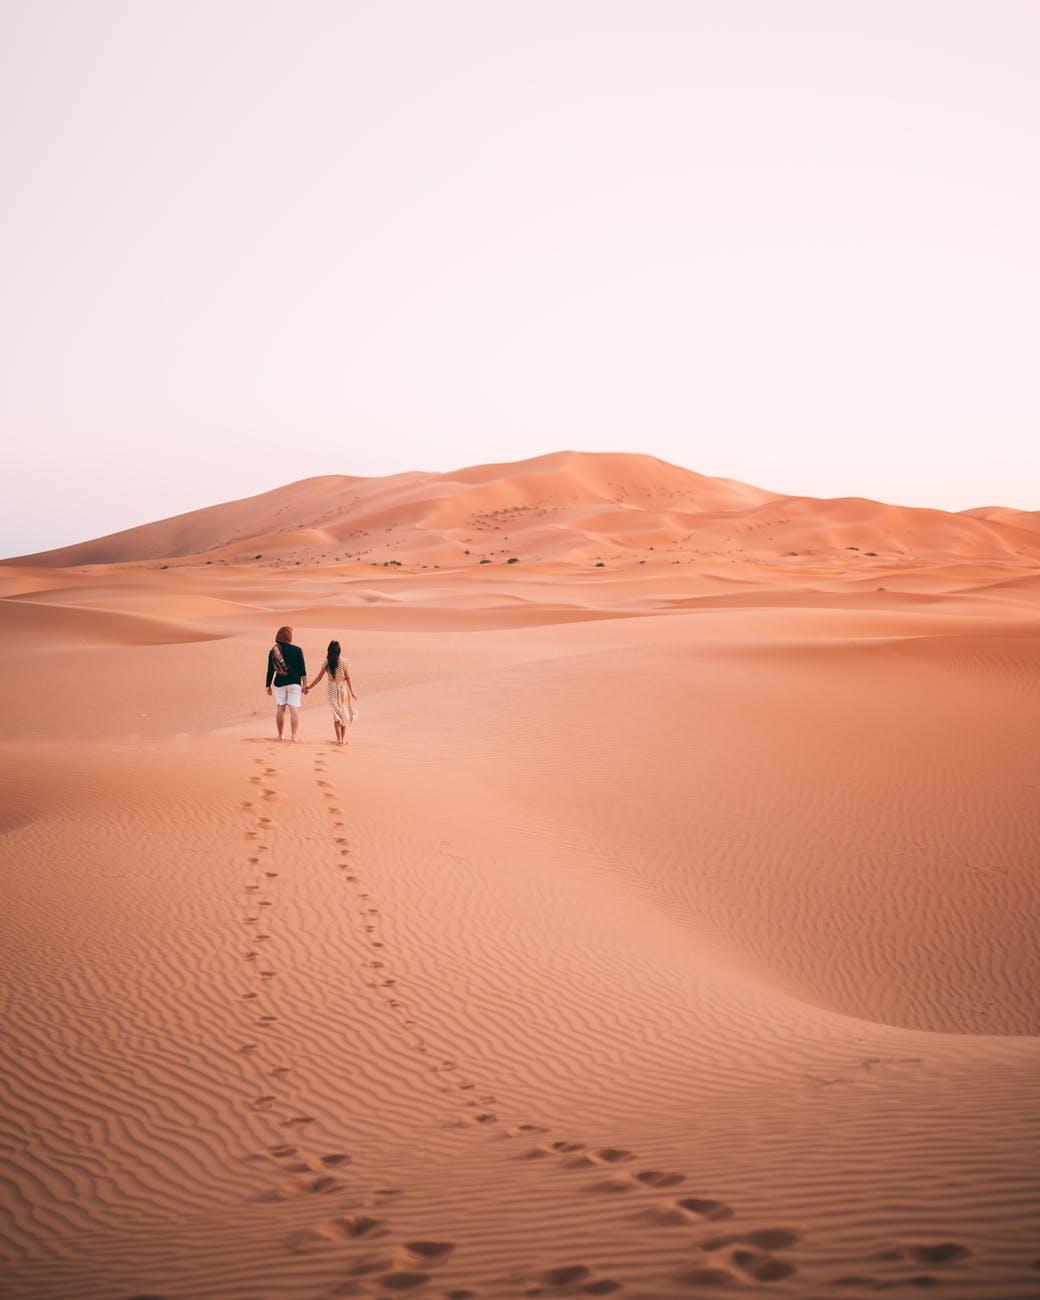 photo of people walking on dessert